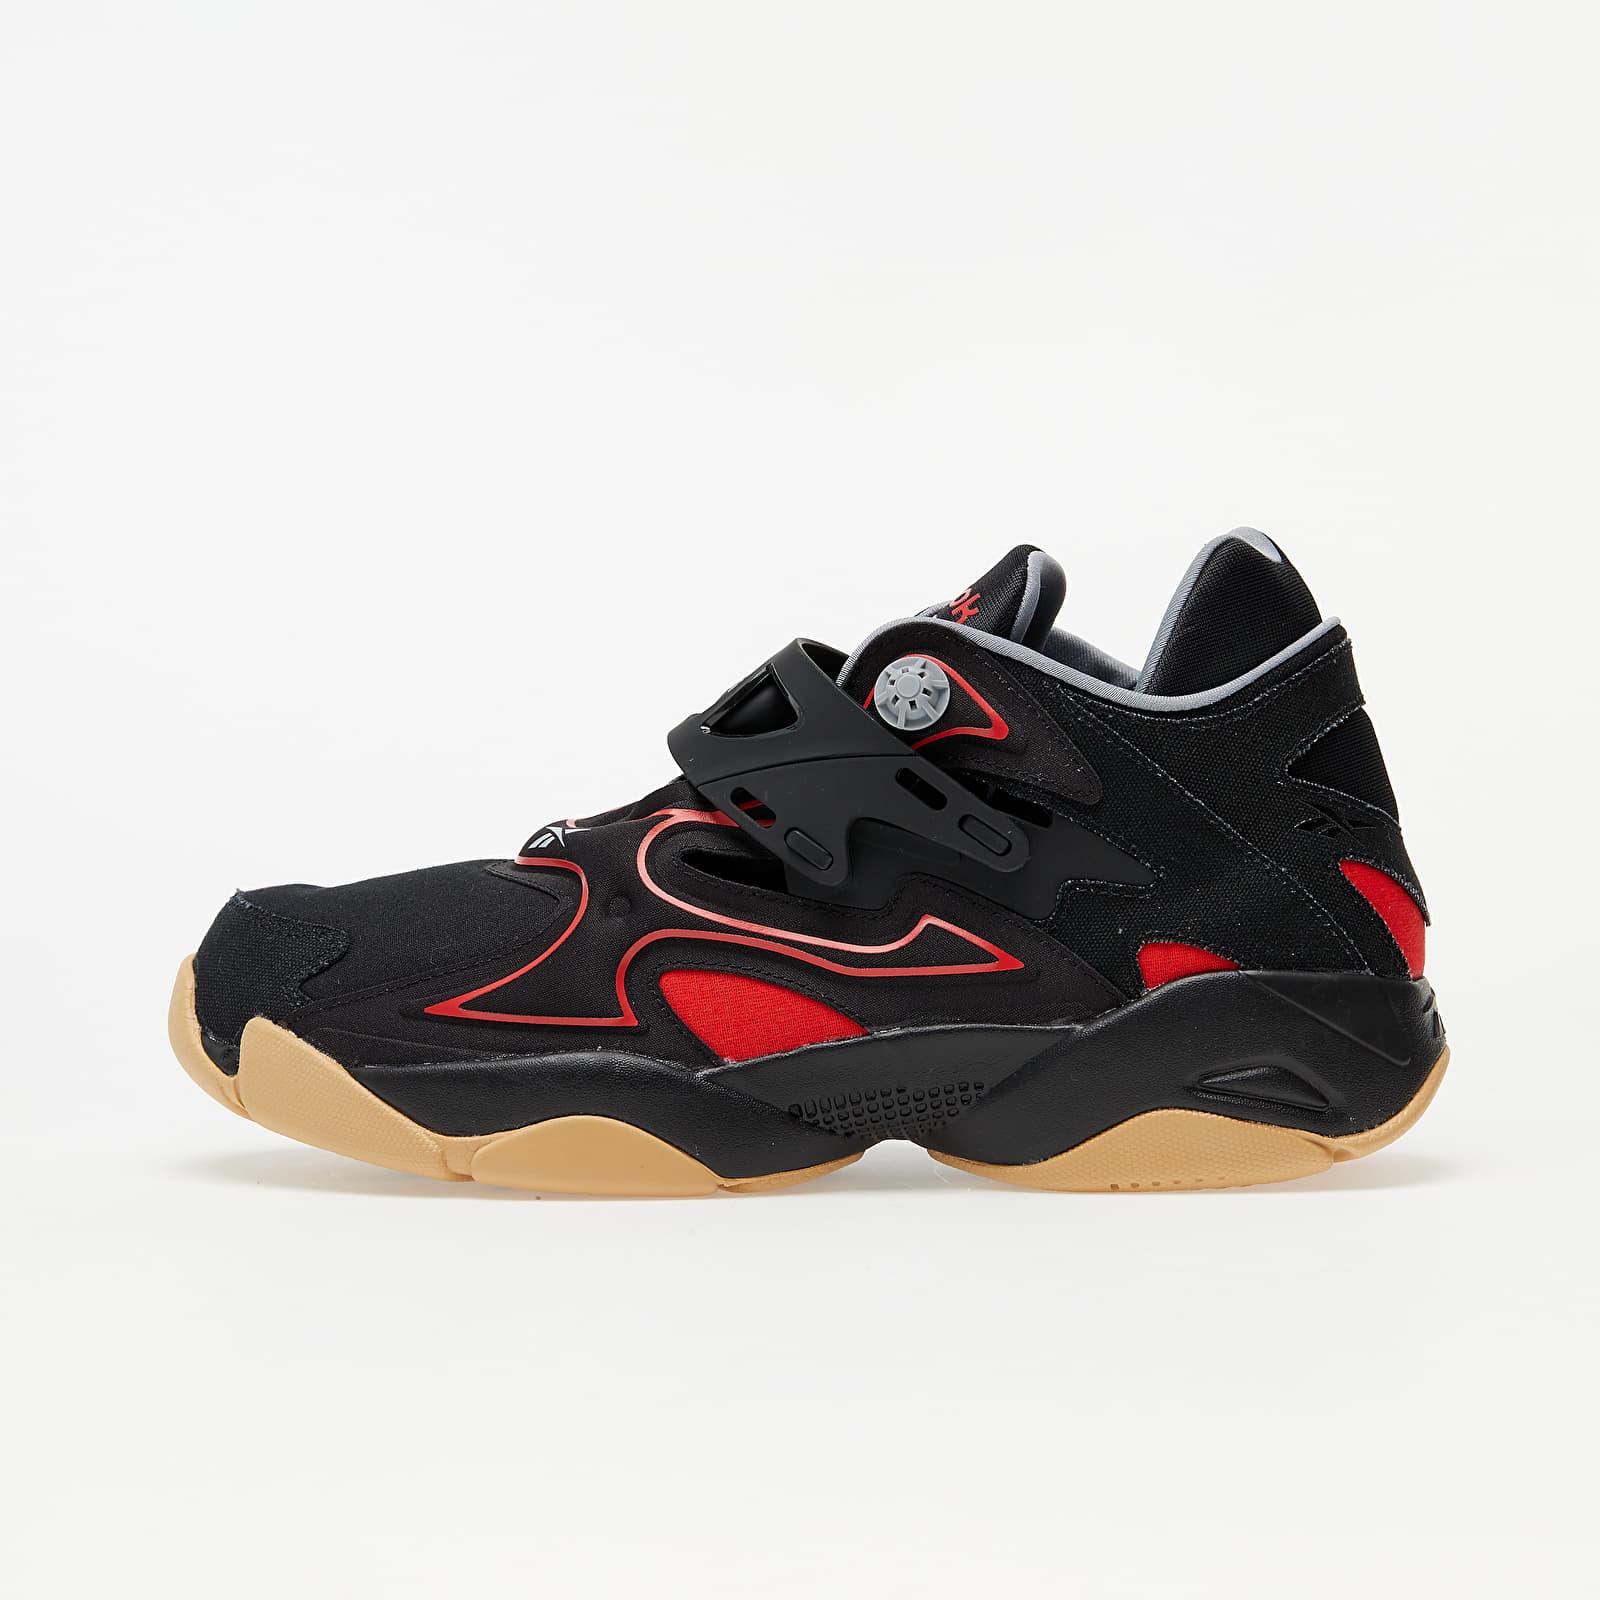 Reebok Pump Court Black/ Insane Red/ Rbkg02 EUR 42.5